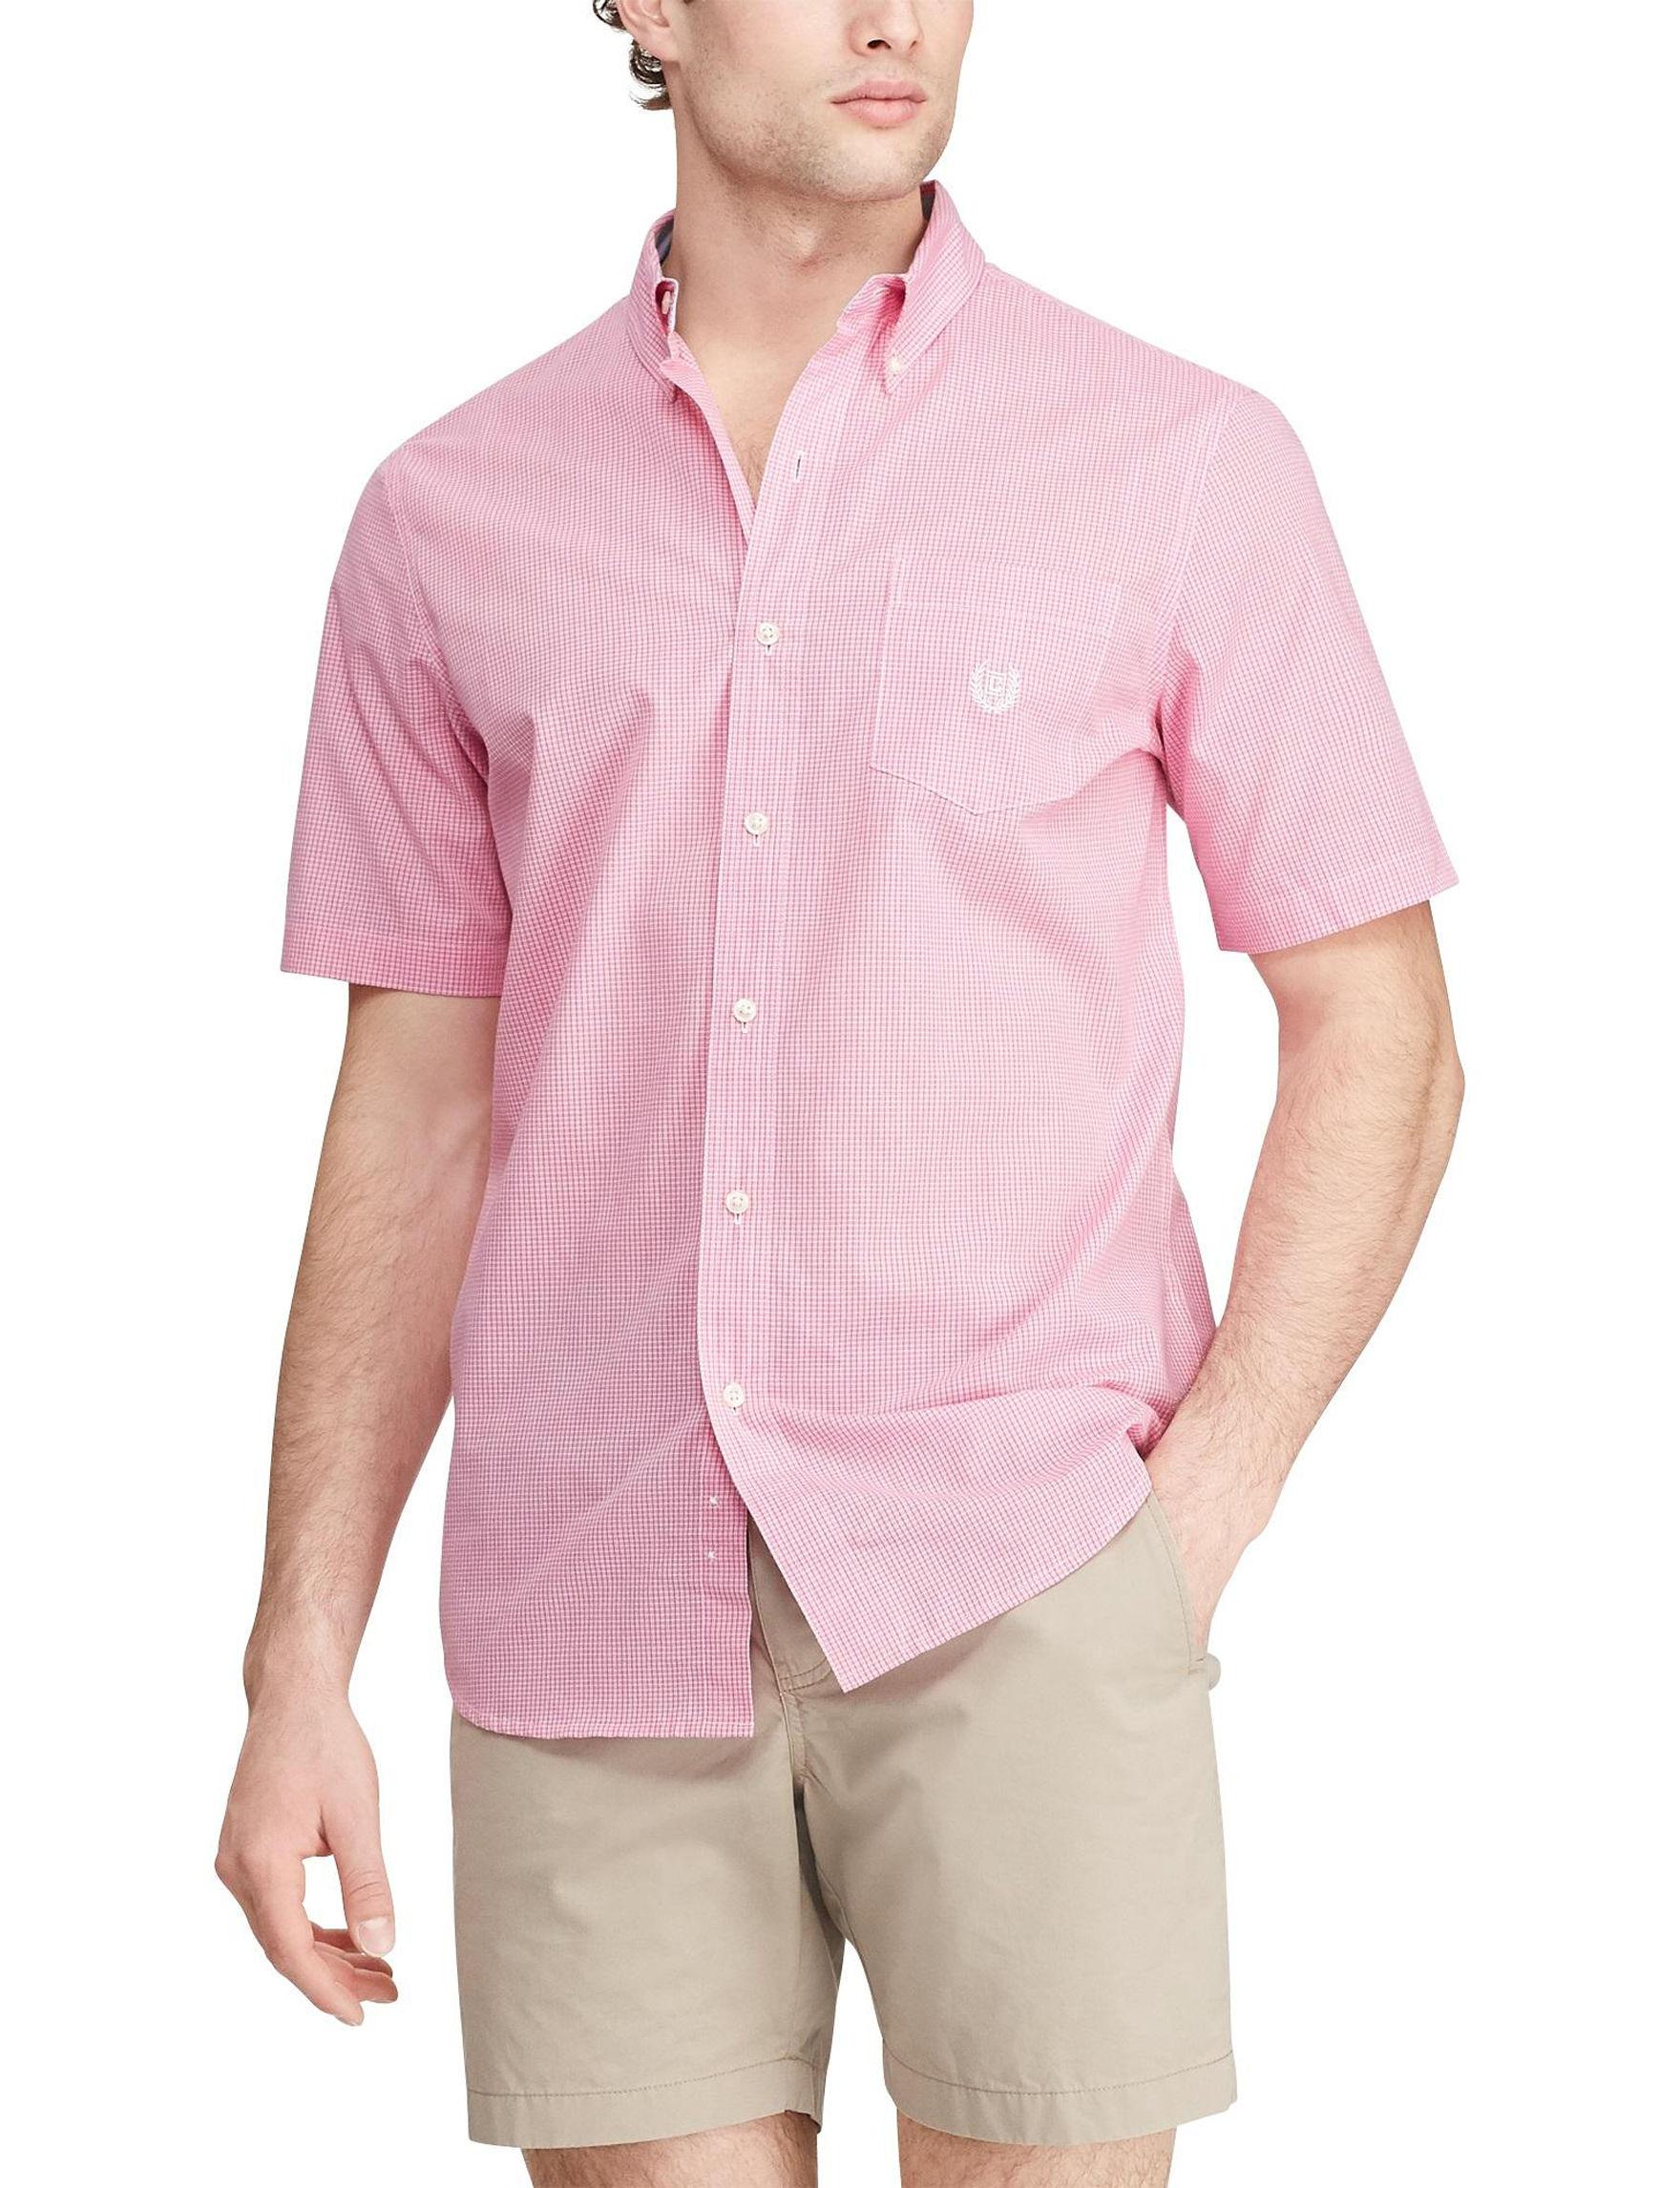 Chaps Baha Pink Casual Button Down Shirts